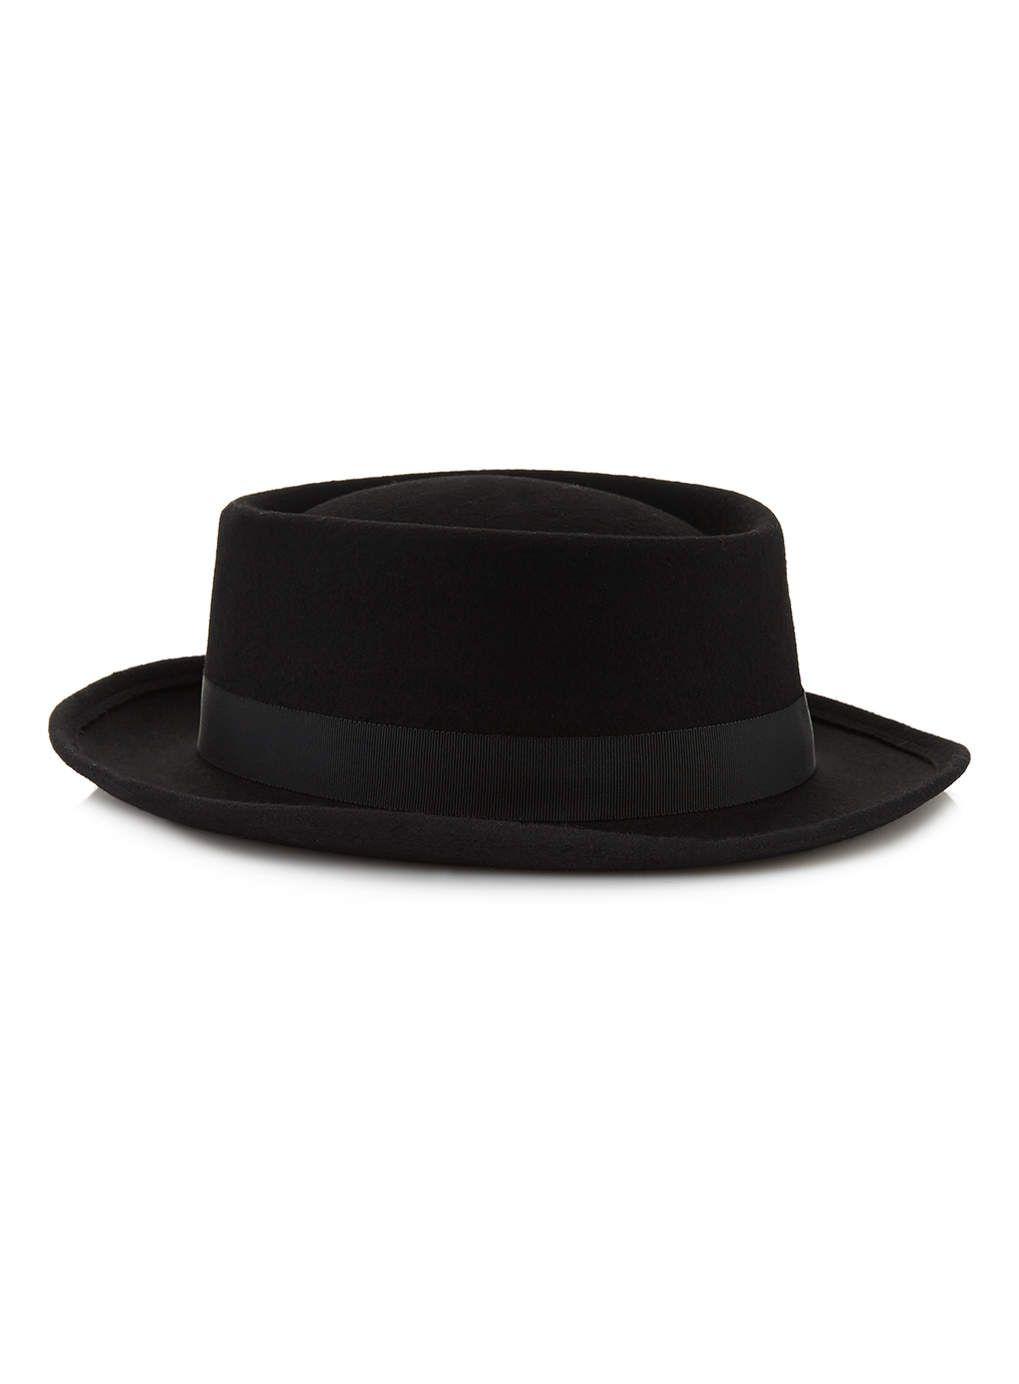 Topman - Black Wool Pork Pie Hat £20  8ddf59ecc65